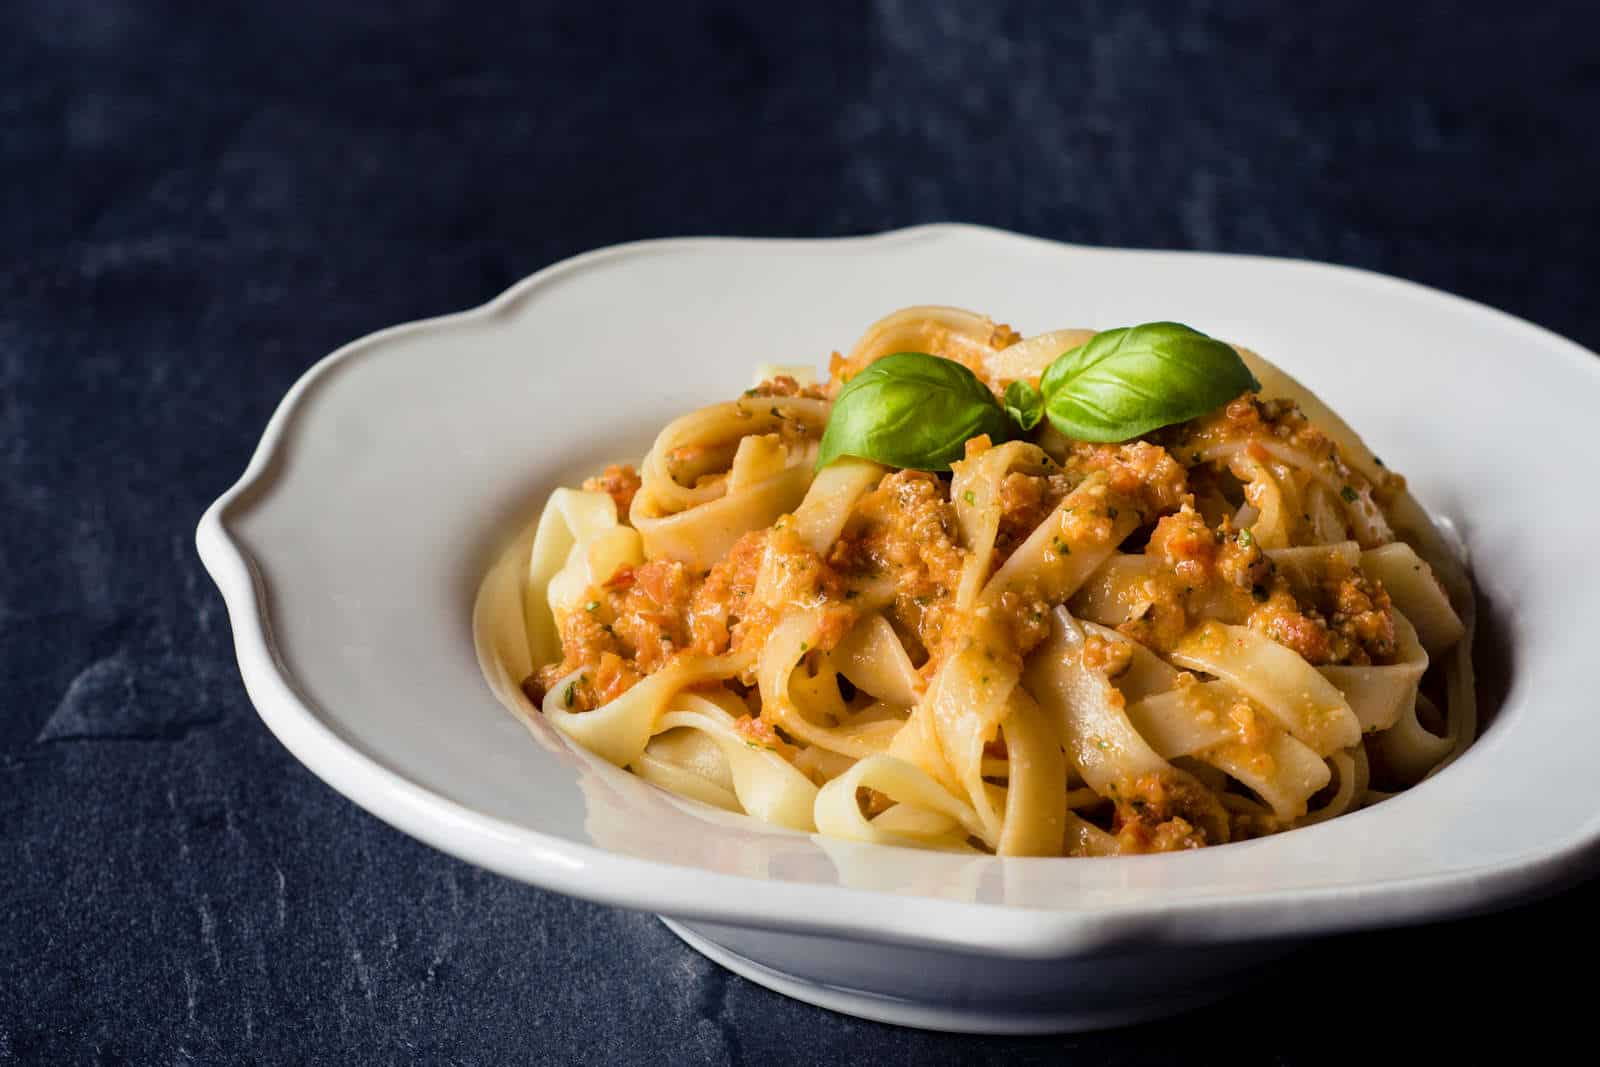 Mazzio's Italian Eatery of Tulsa